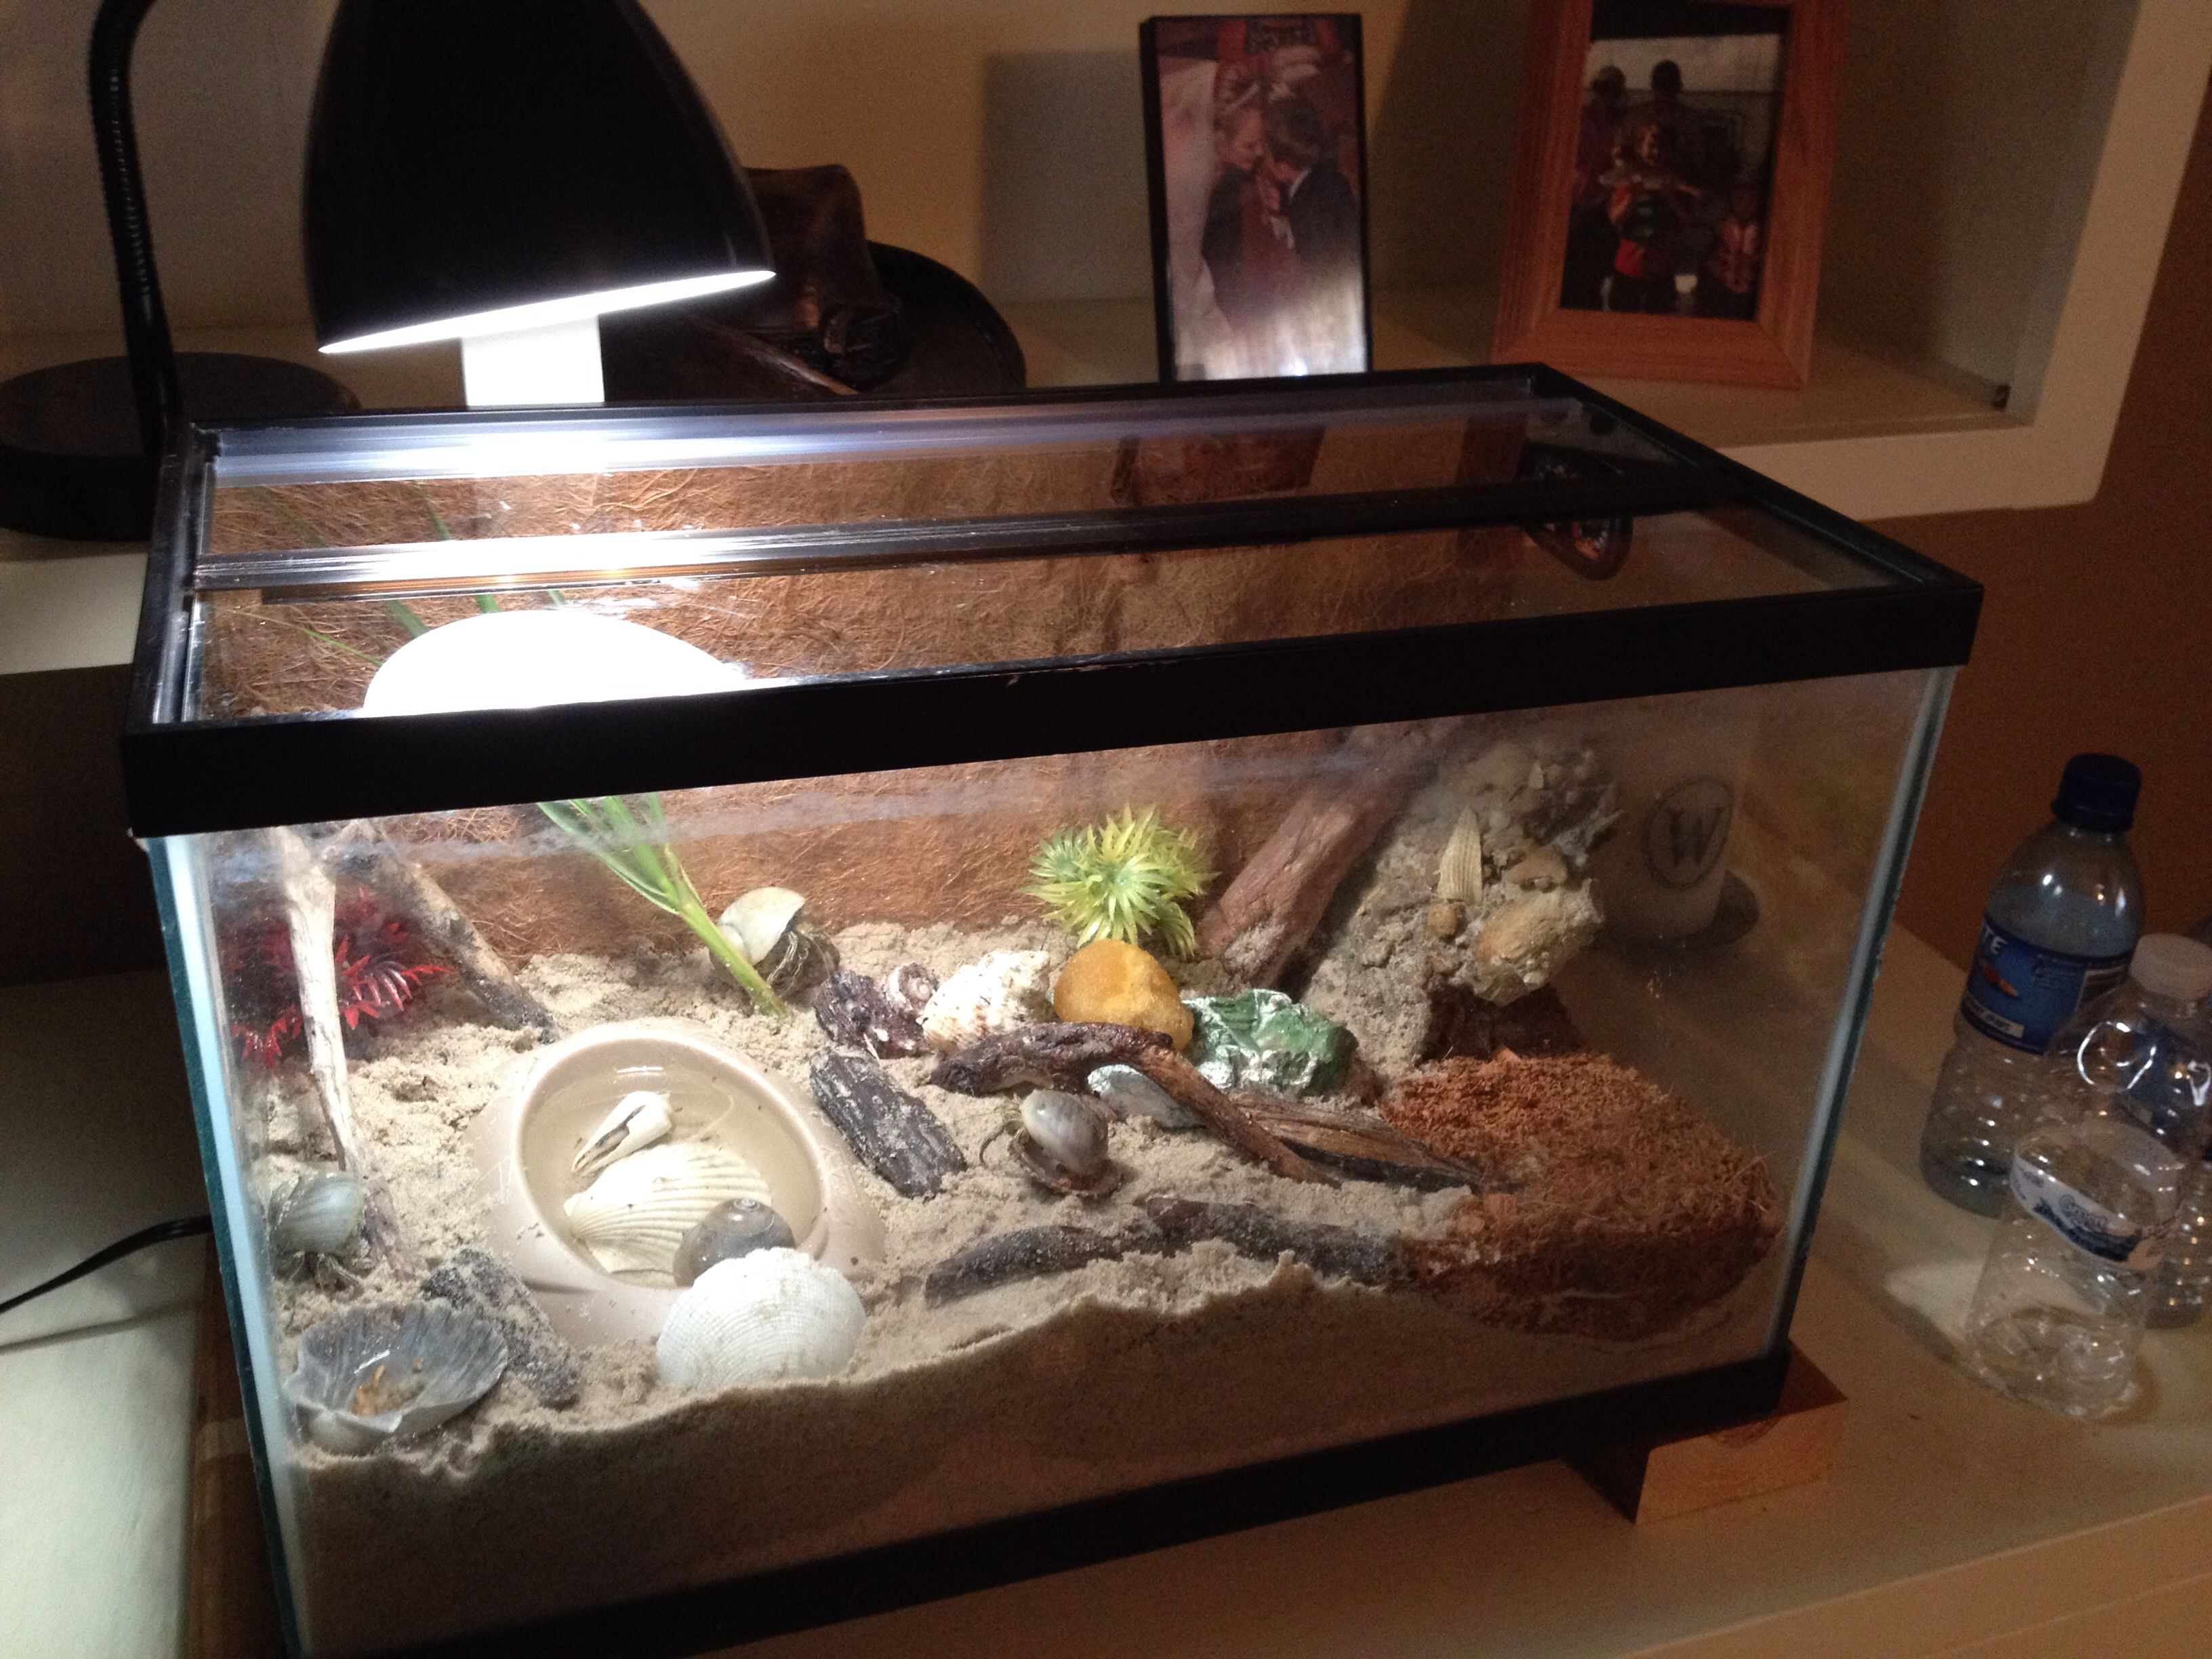 Dyi Wild Hermit Crab Habitat